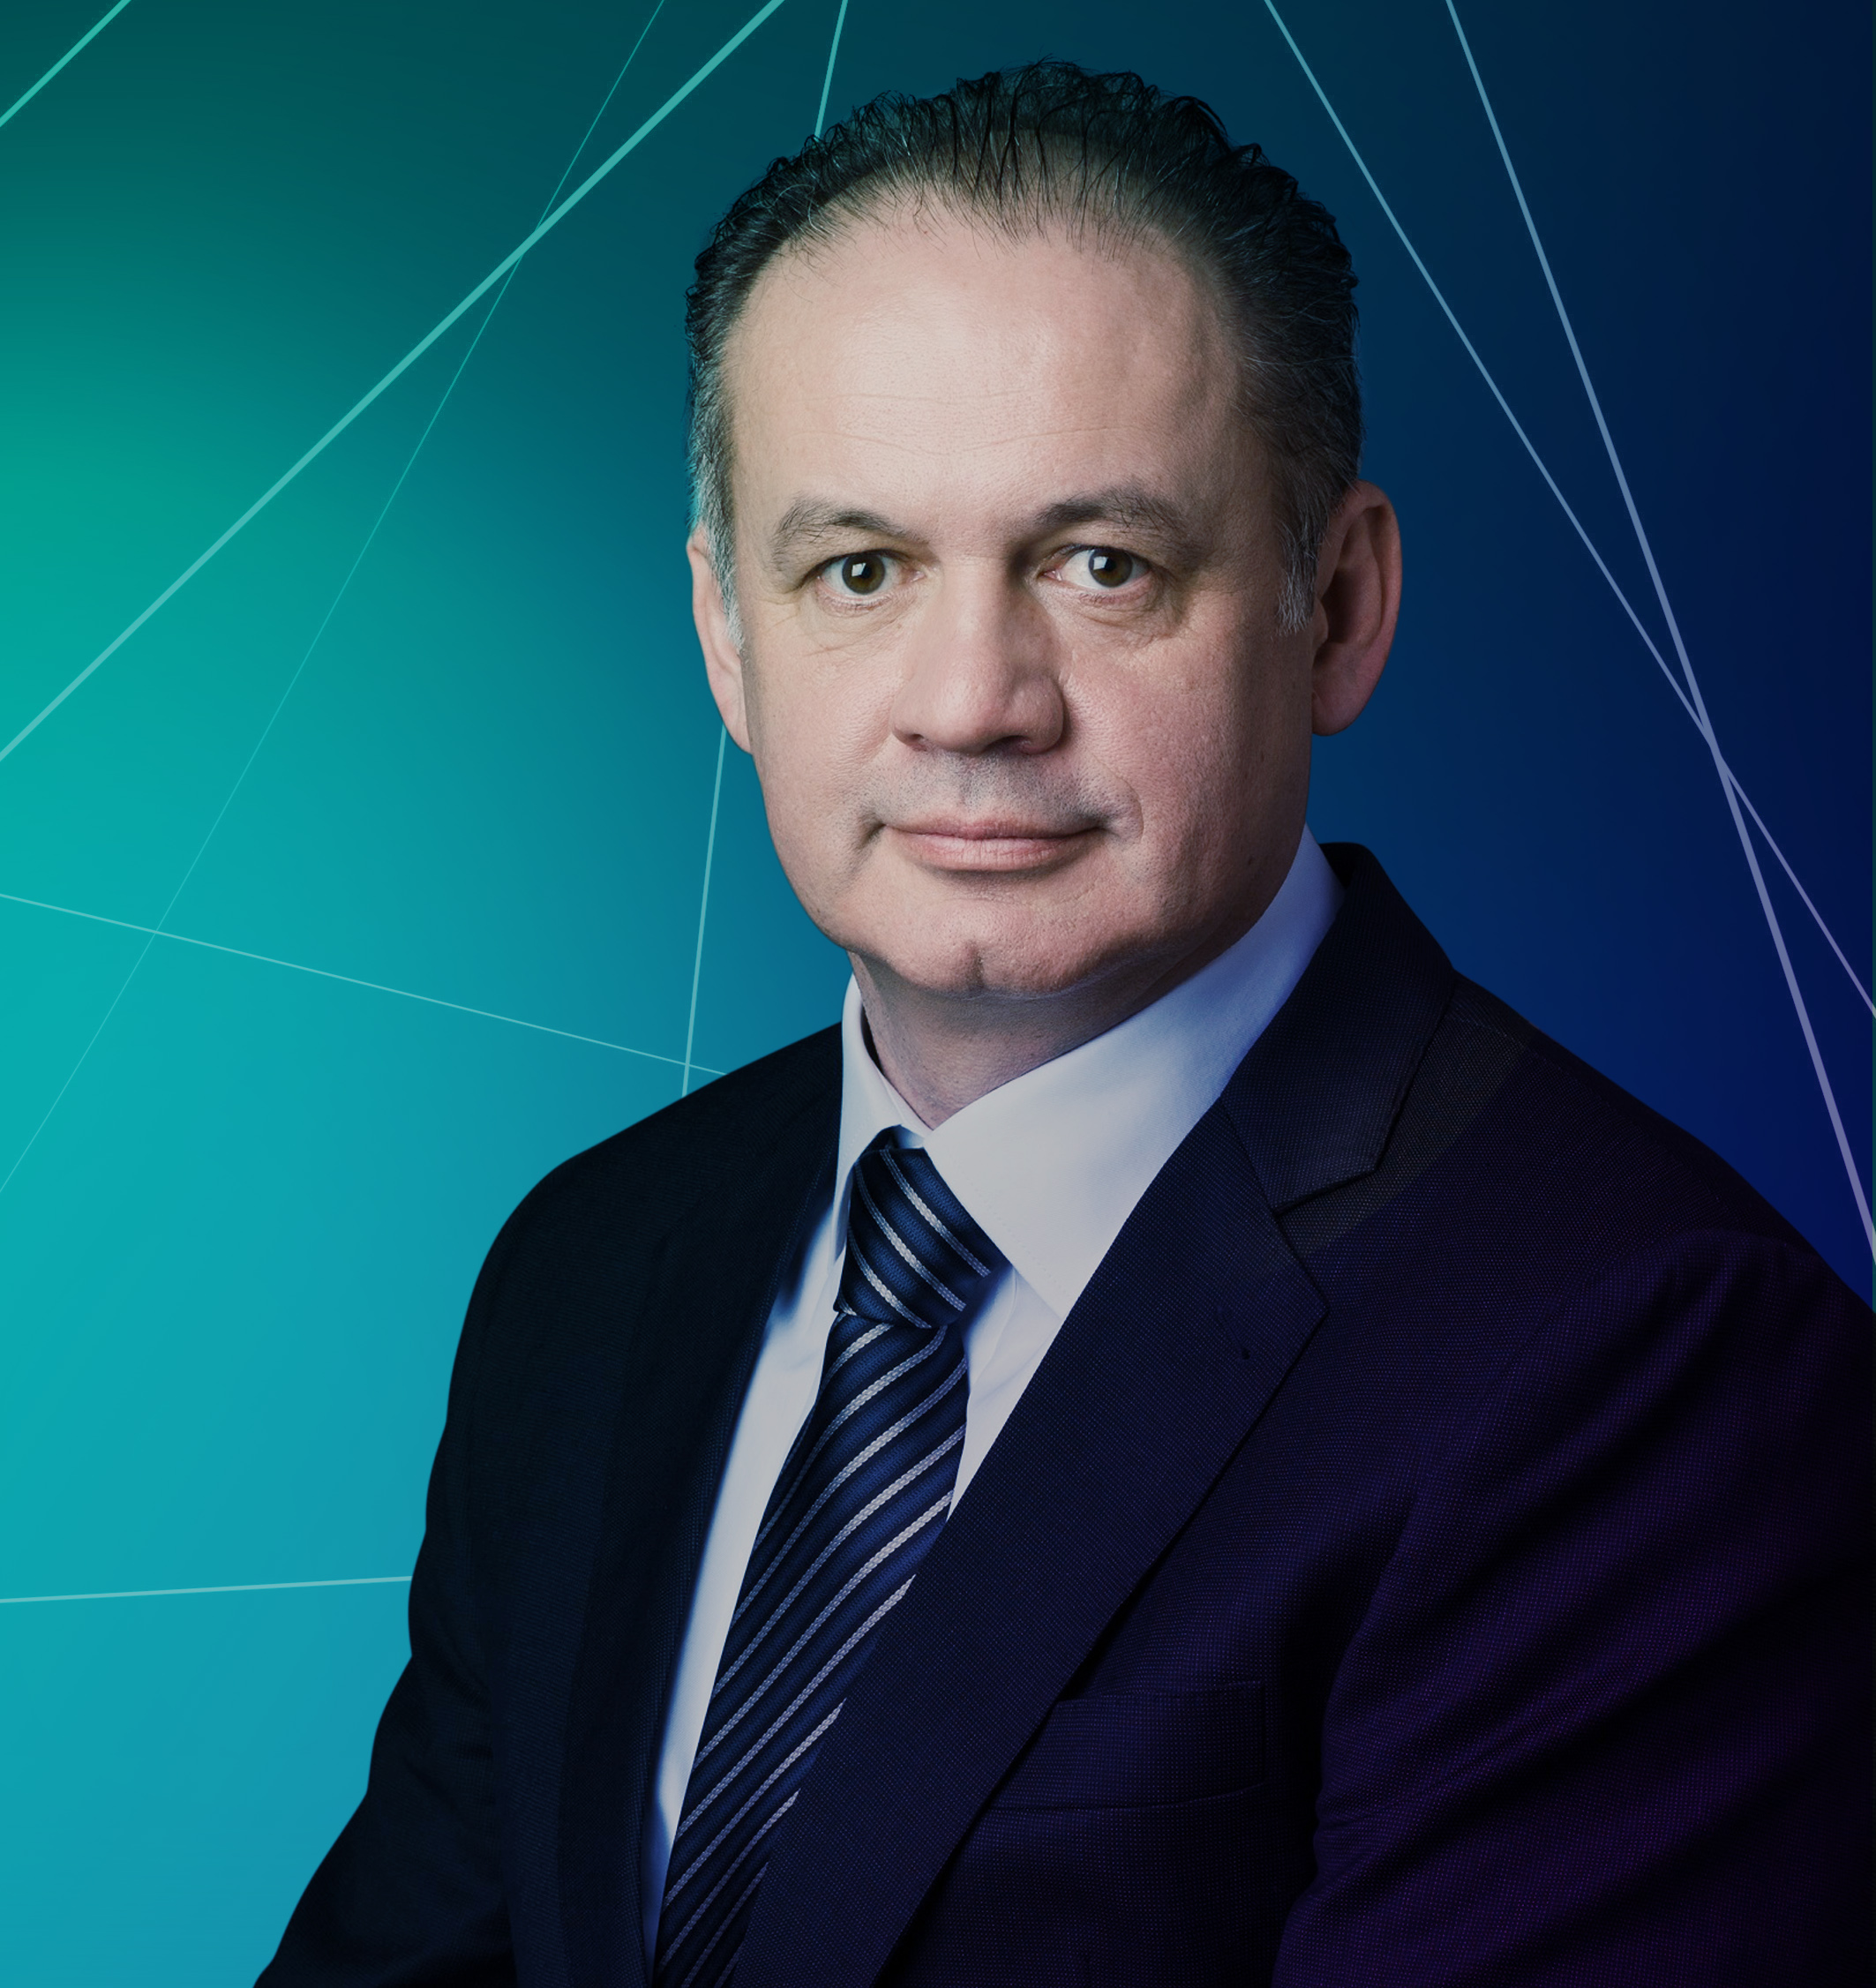 Andrej Kiska Future Port Prague 10.—11. 9. 2019